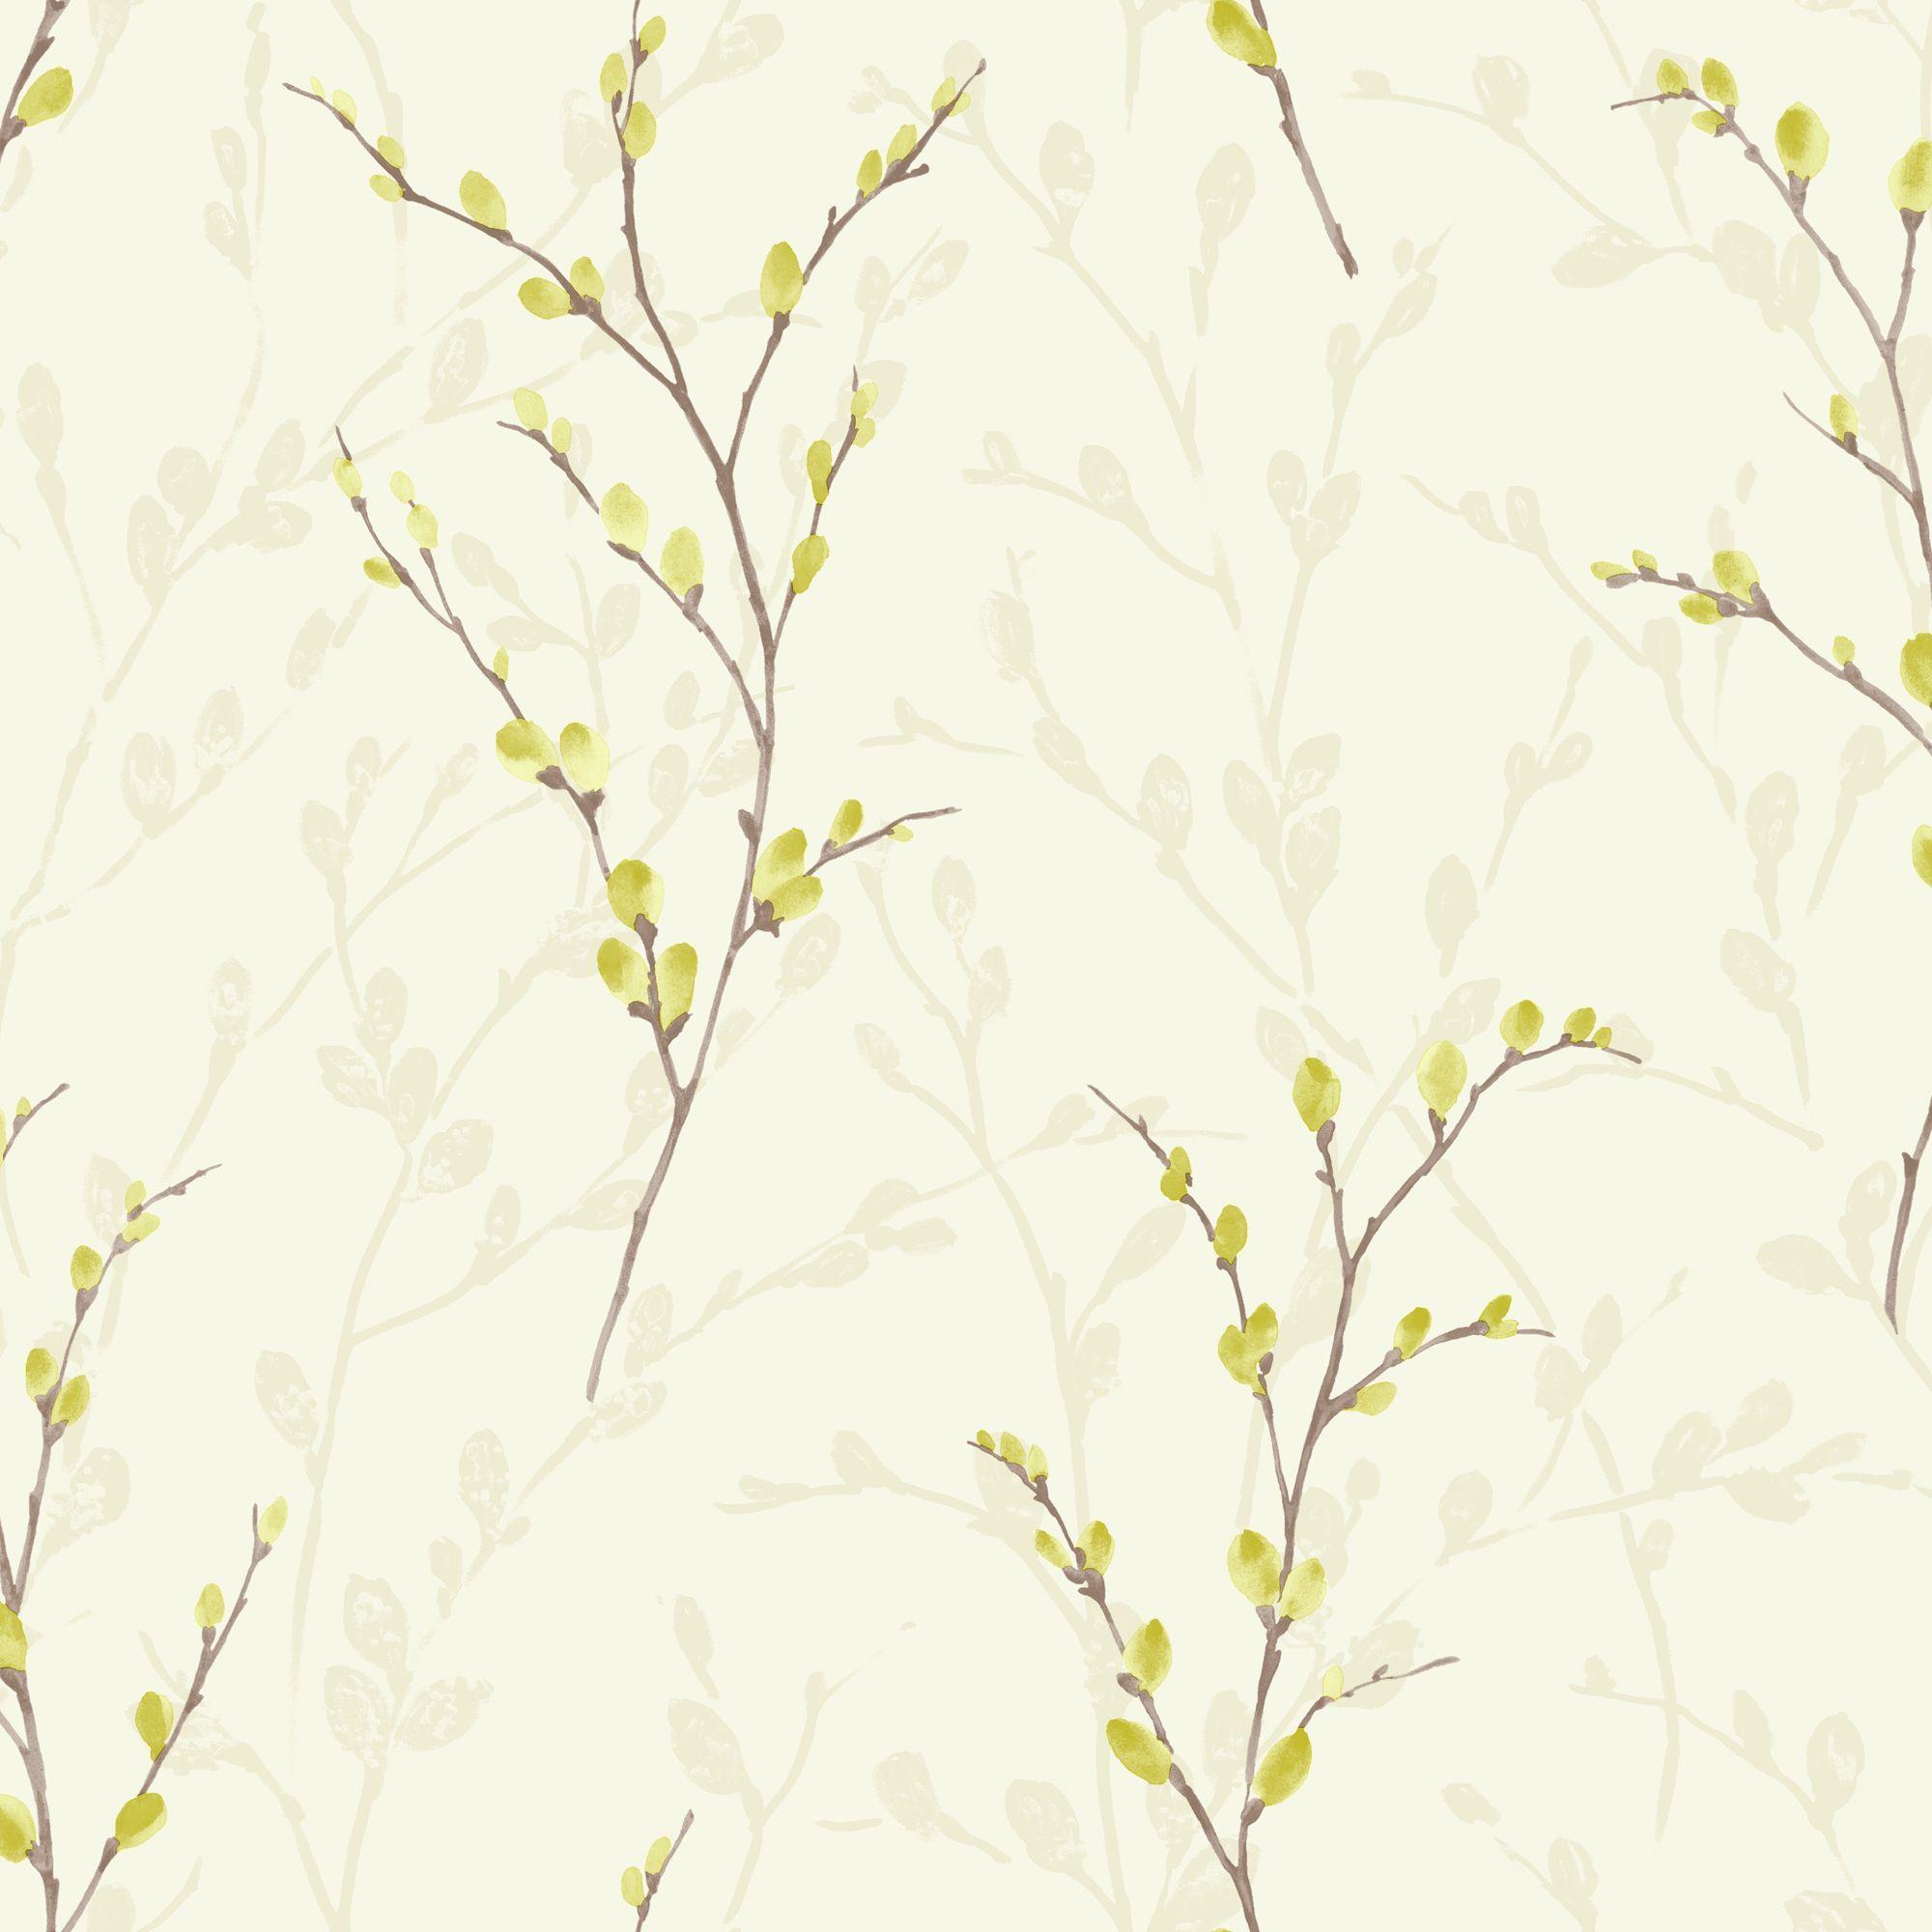 Home diy wallpaper illustration arthouse imagine fern plum motif vinyl - Arthouse Eco Willow Green Wallpaper Departments Diy At B Q